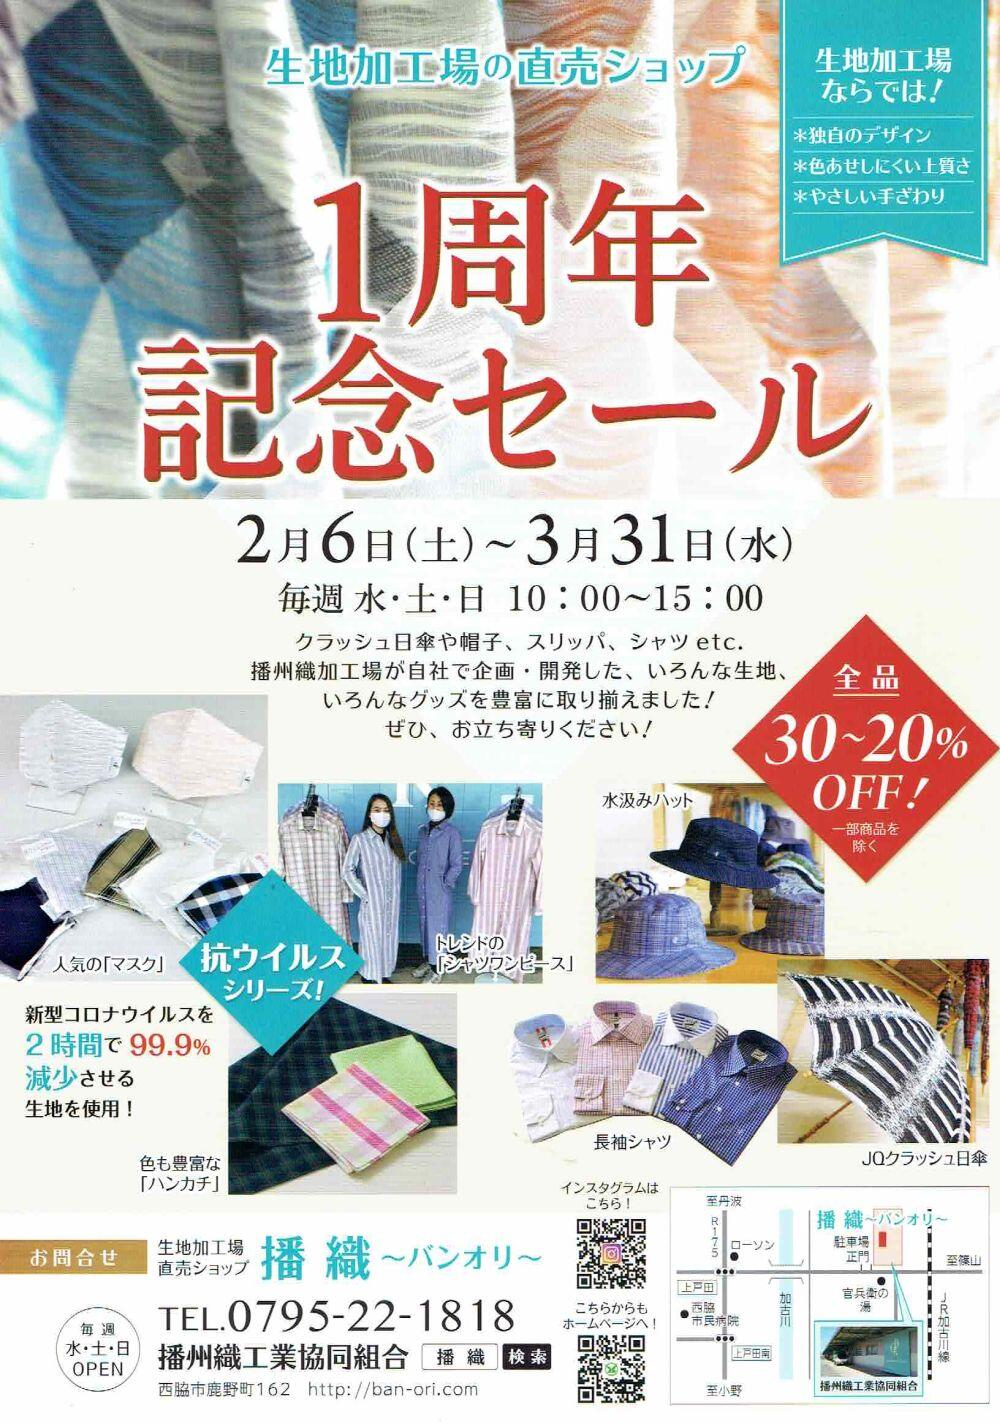 ~3/31 1周年記念セール:播州織工業協同組合